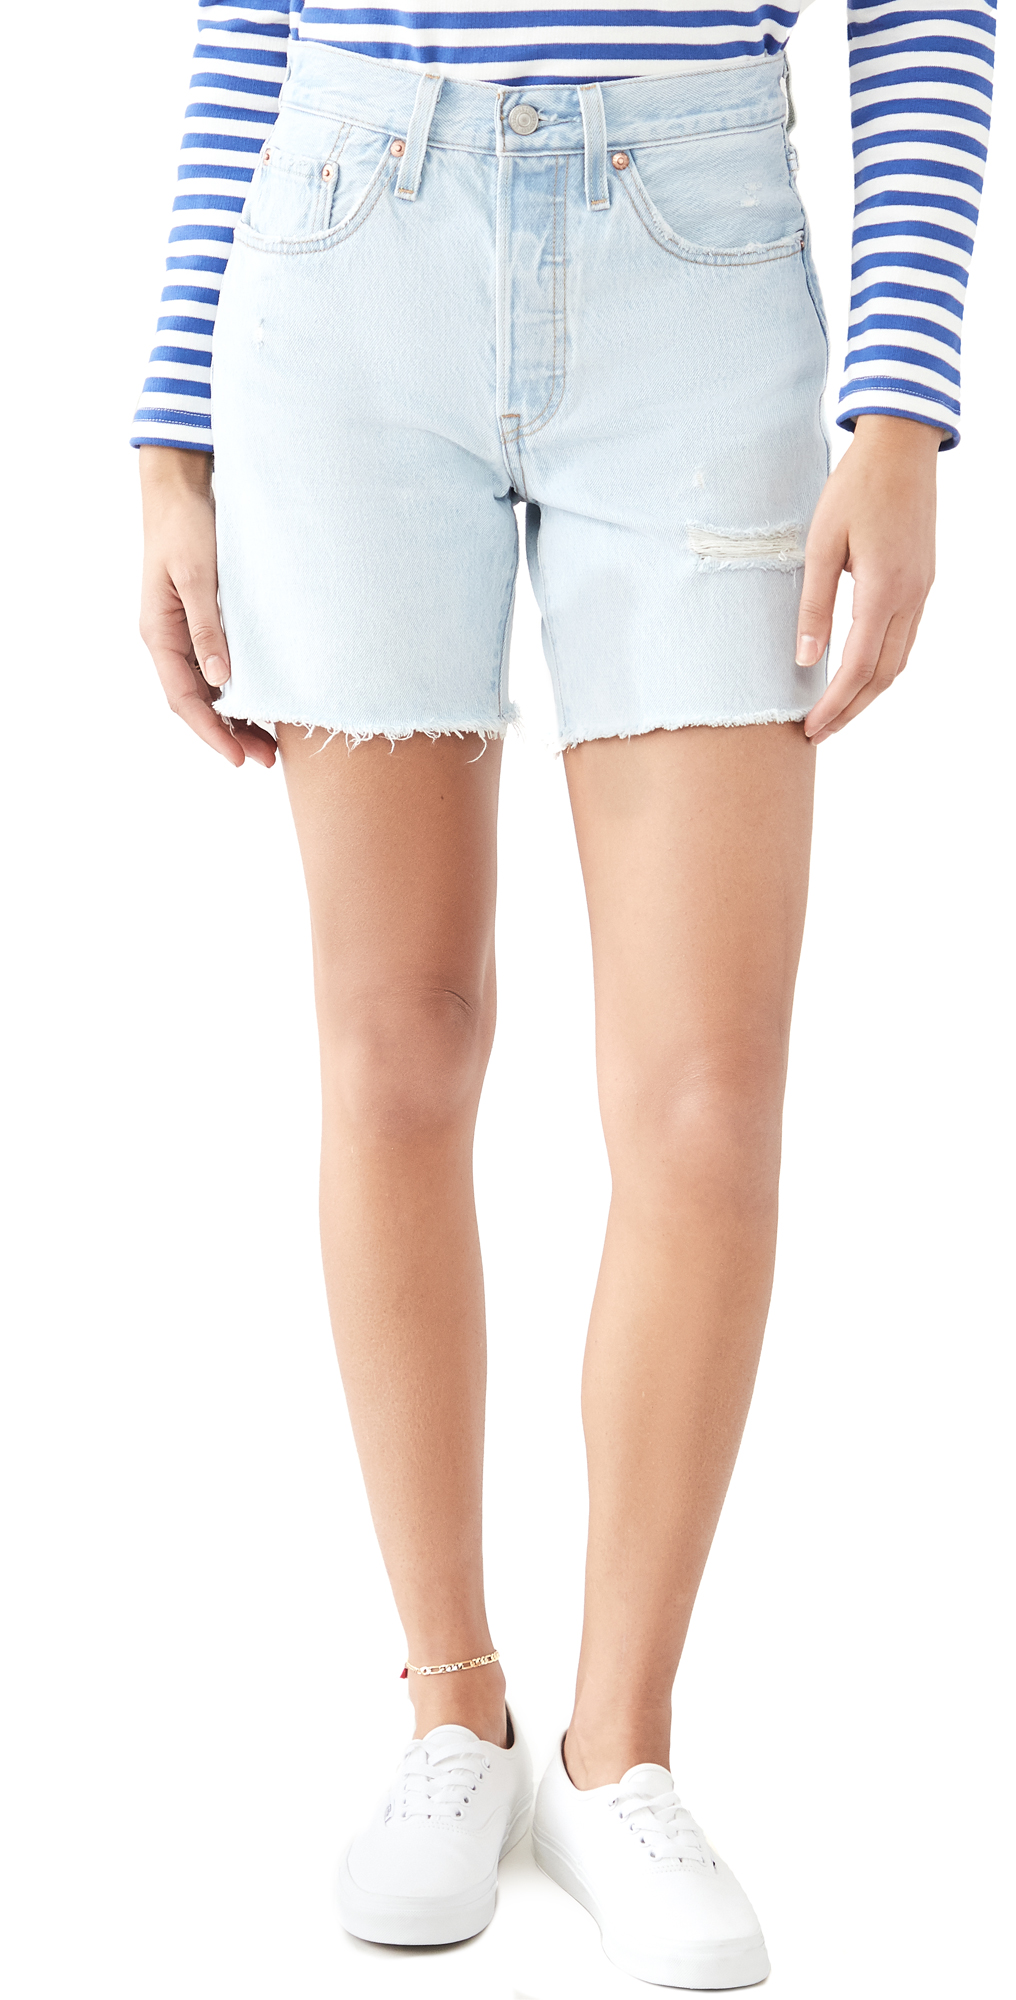 Levi's 501 Mid Thigh Shorts